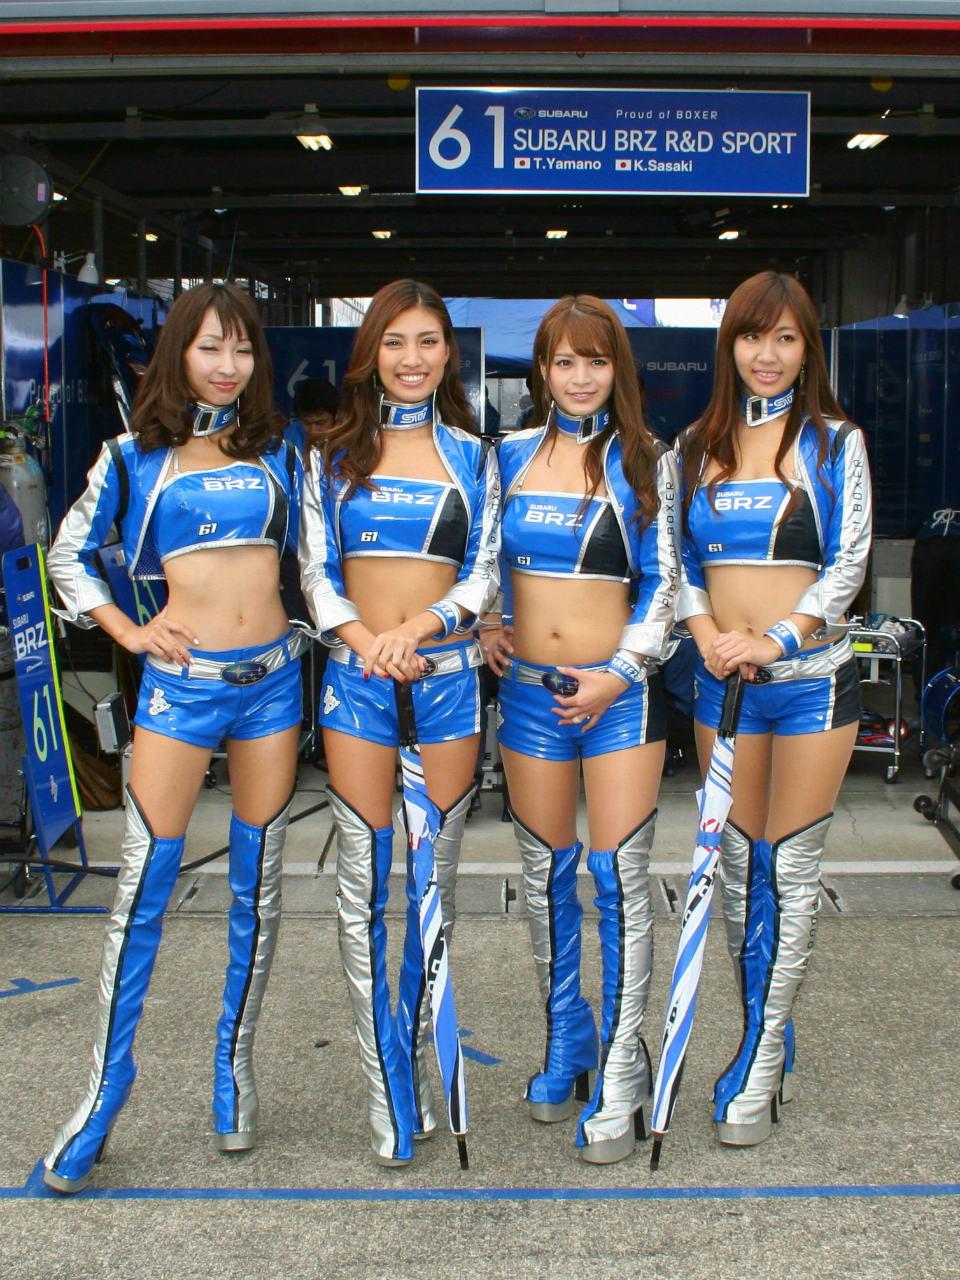 2013 Super Gt もてぎ 予選日(ピットウォーク編2)|インプレッサ スバル|愛車フォトギャラリー|白の